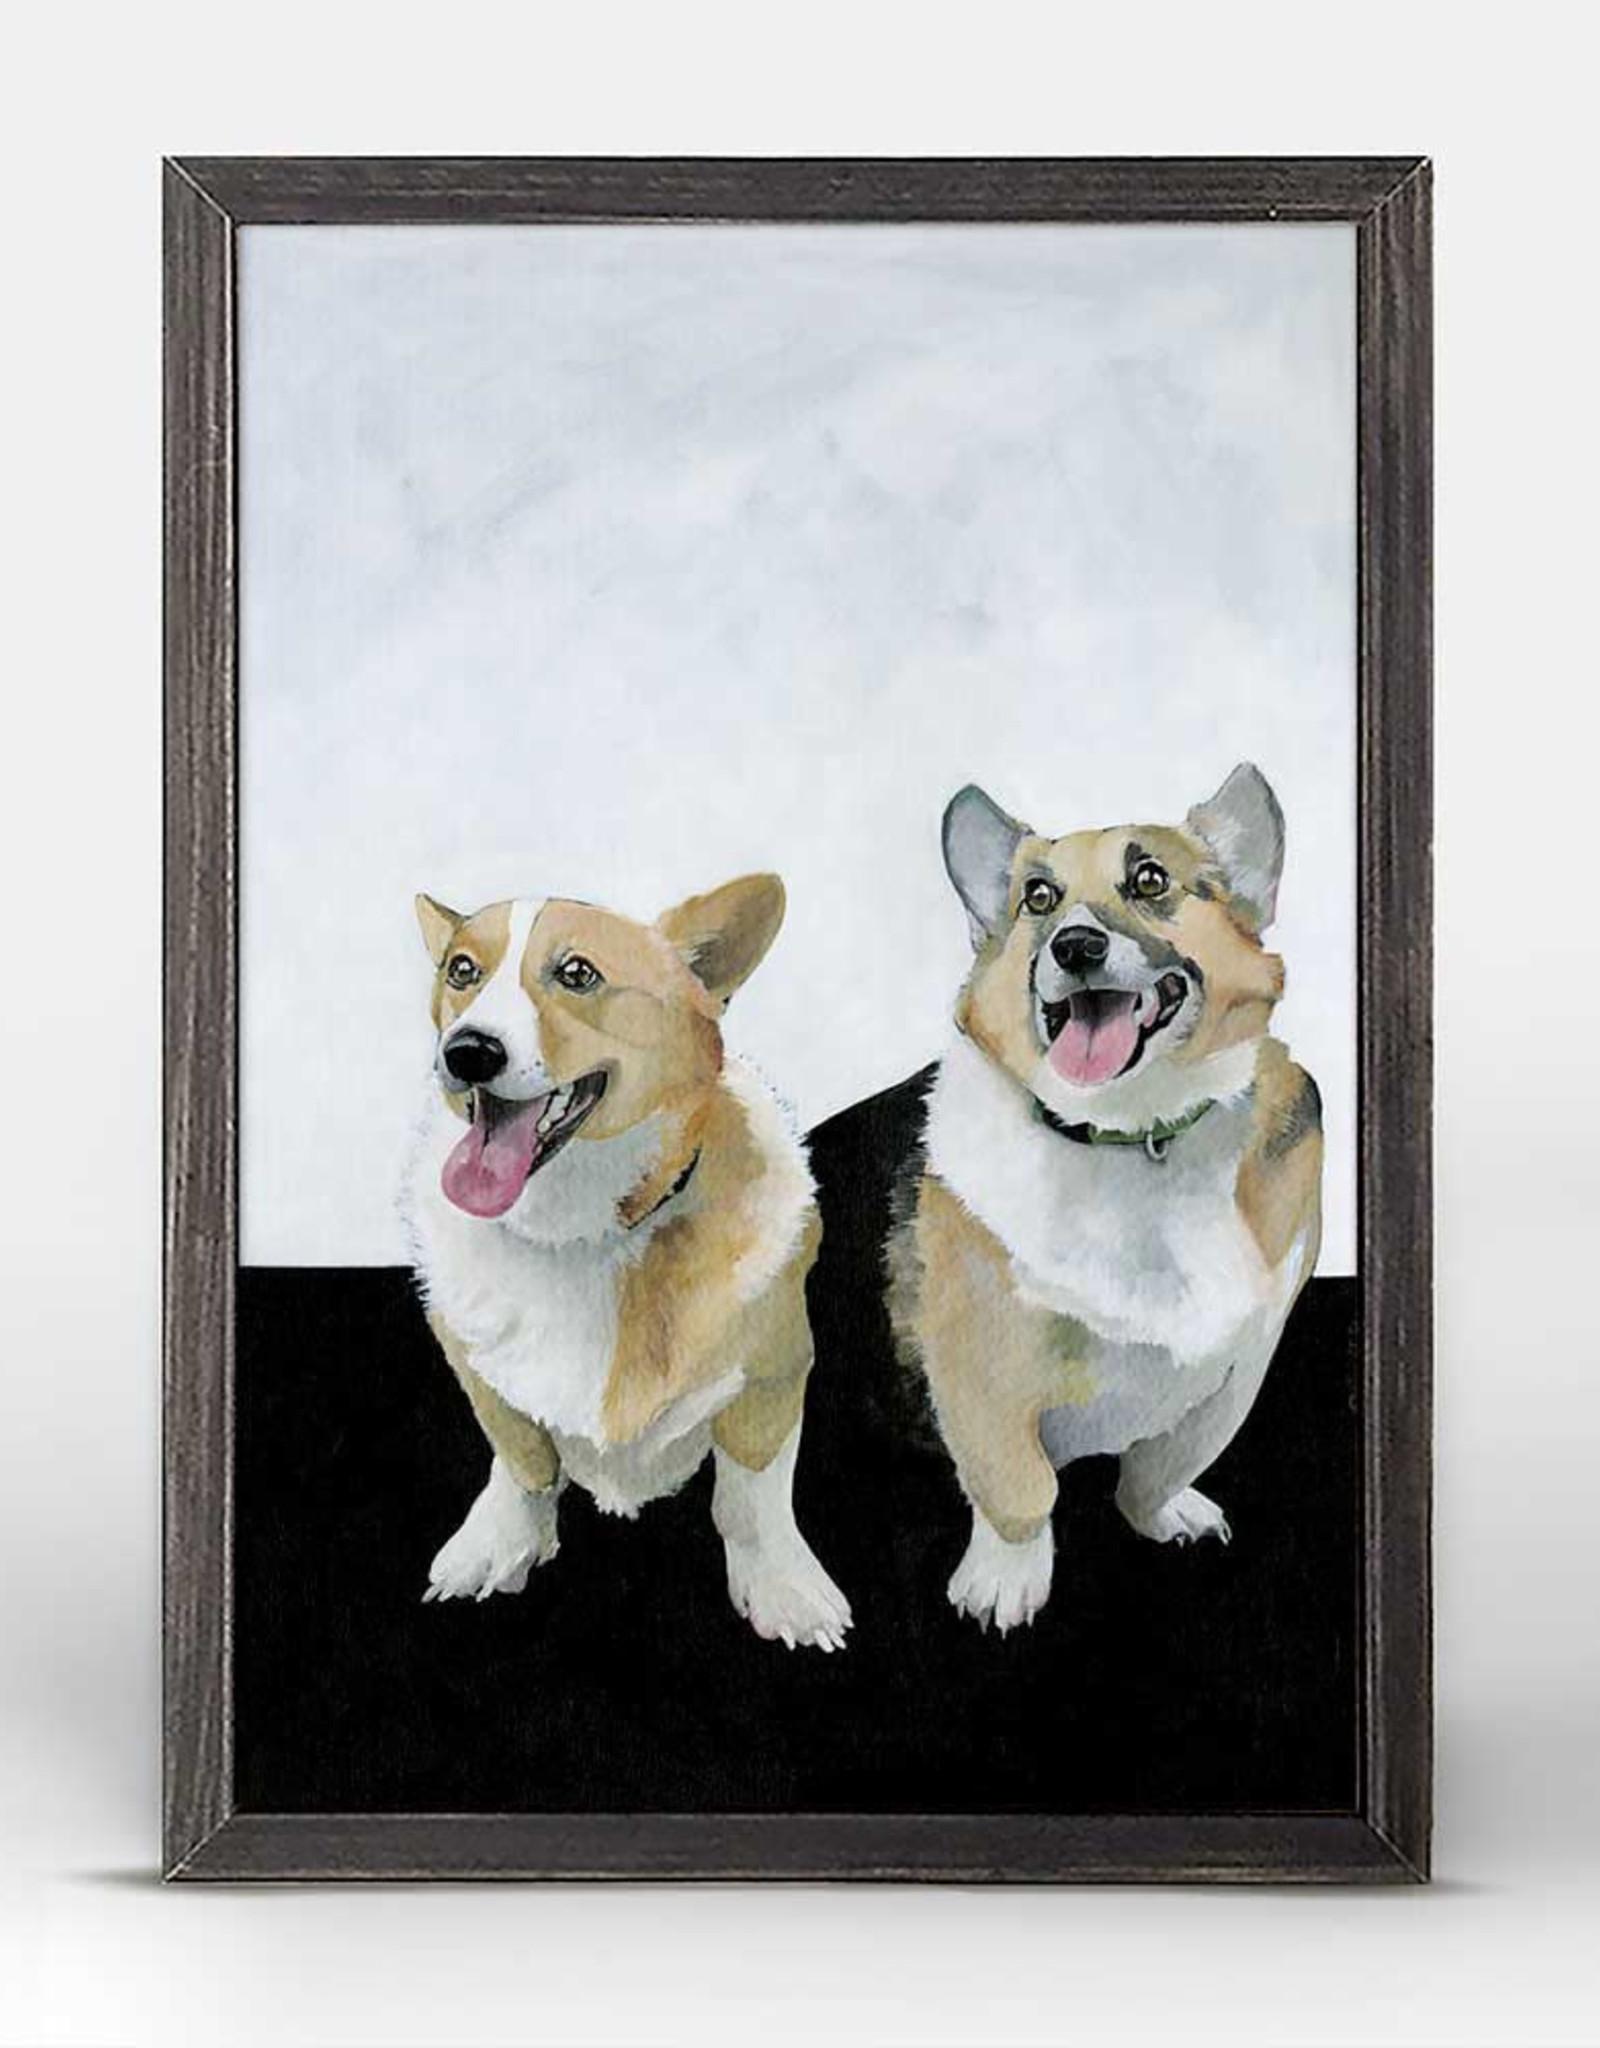 Greenbox Art Olive & Nash Rustic Black Mini Framed Canvas